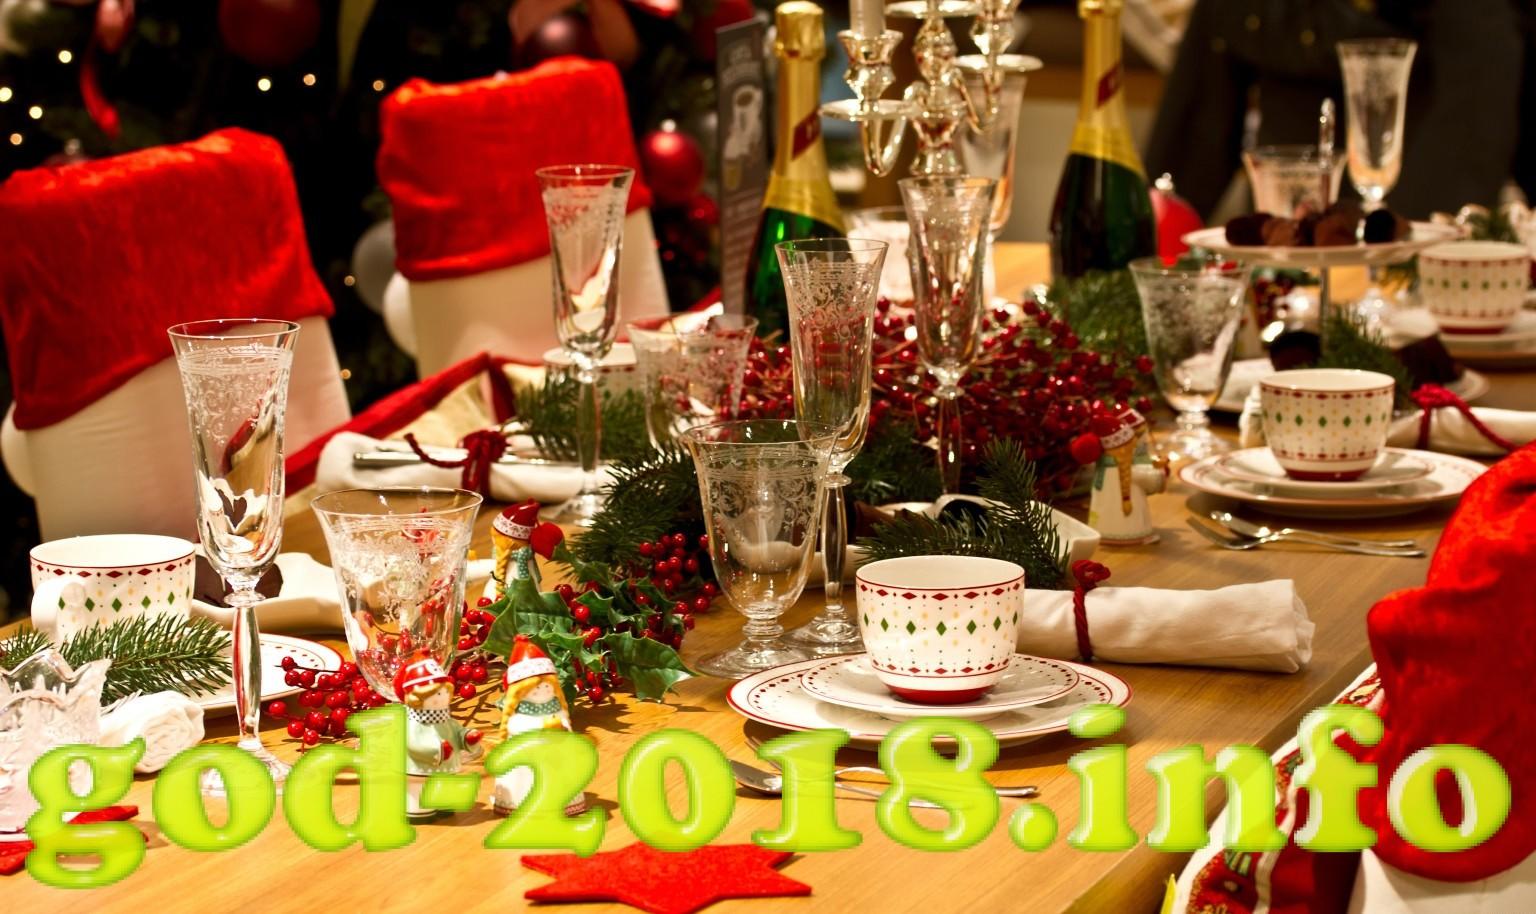 restorany-v-novogodnjuju-noch-v-rostove-na-donu-novyj-god-2018-foto